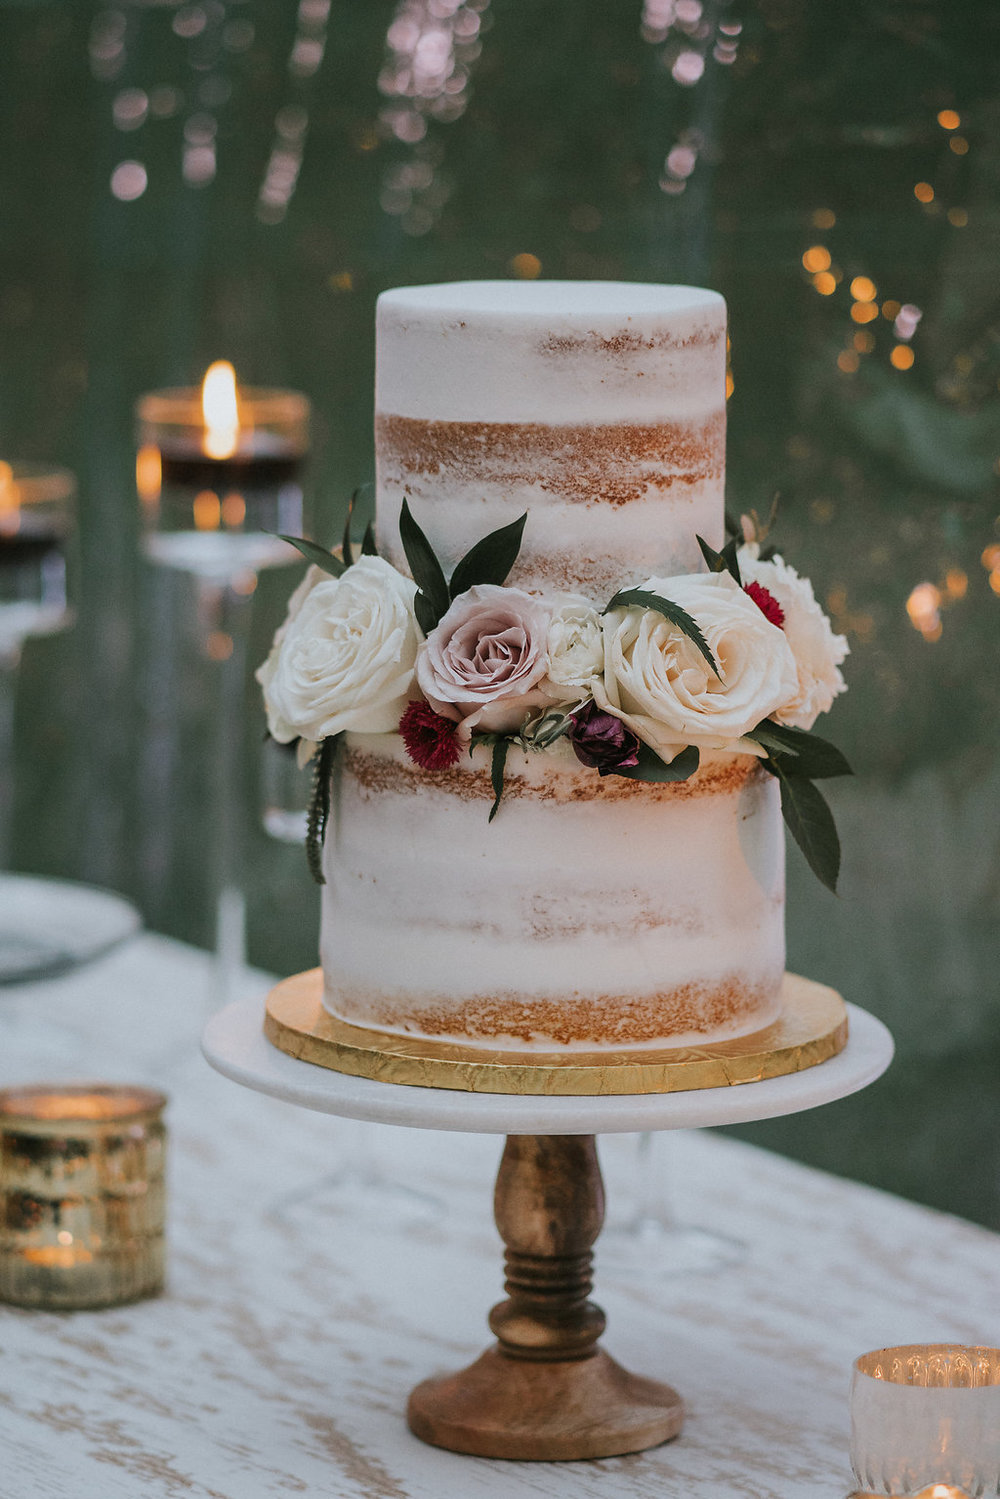 Simple Rustic Naked Wedding Cake